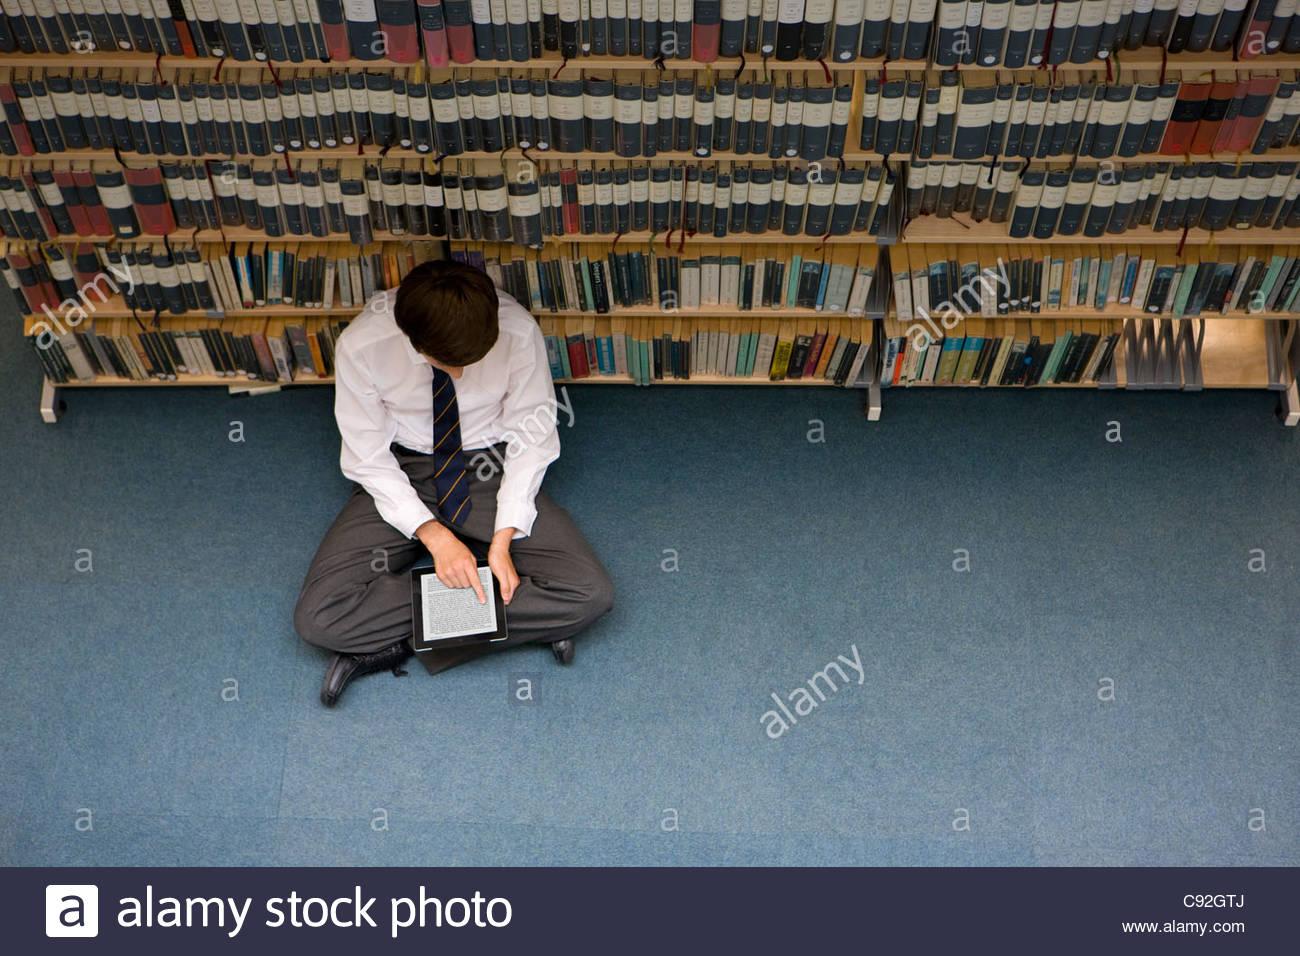 Male student lecture sur livre électronique digital tablet in library Photo Stock